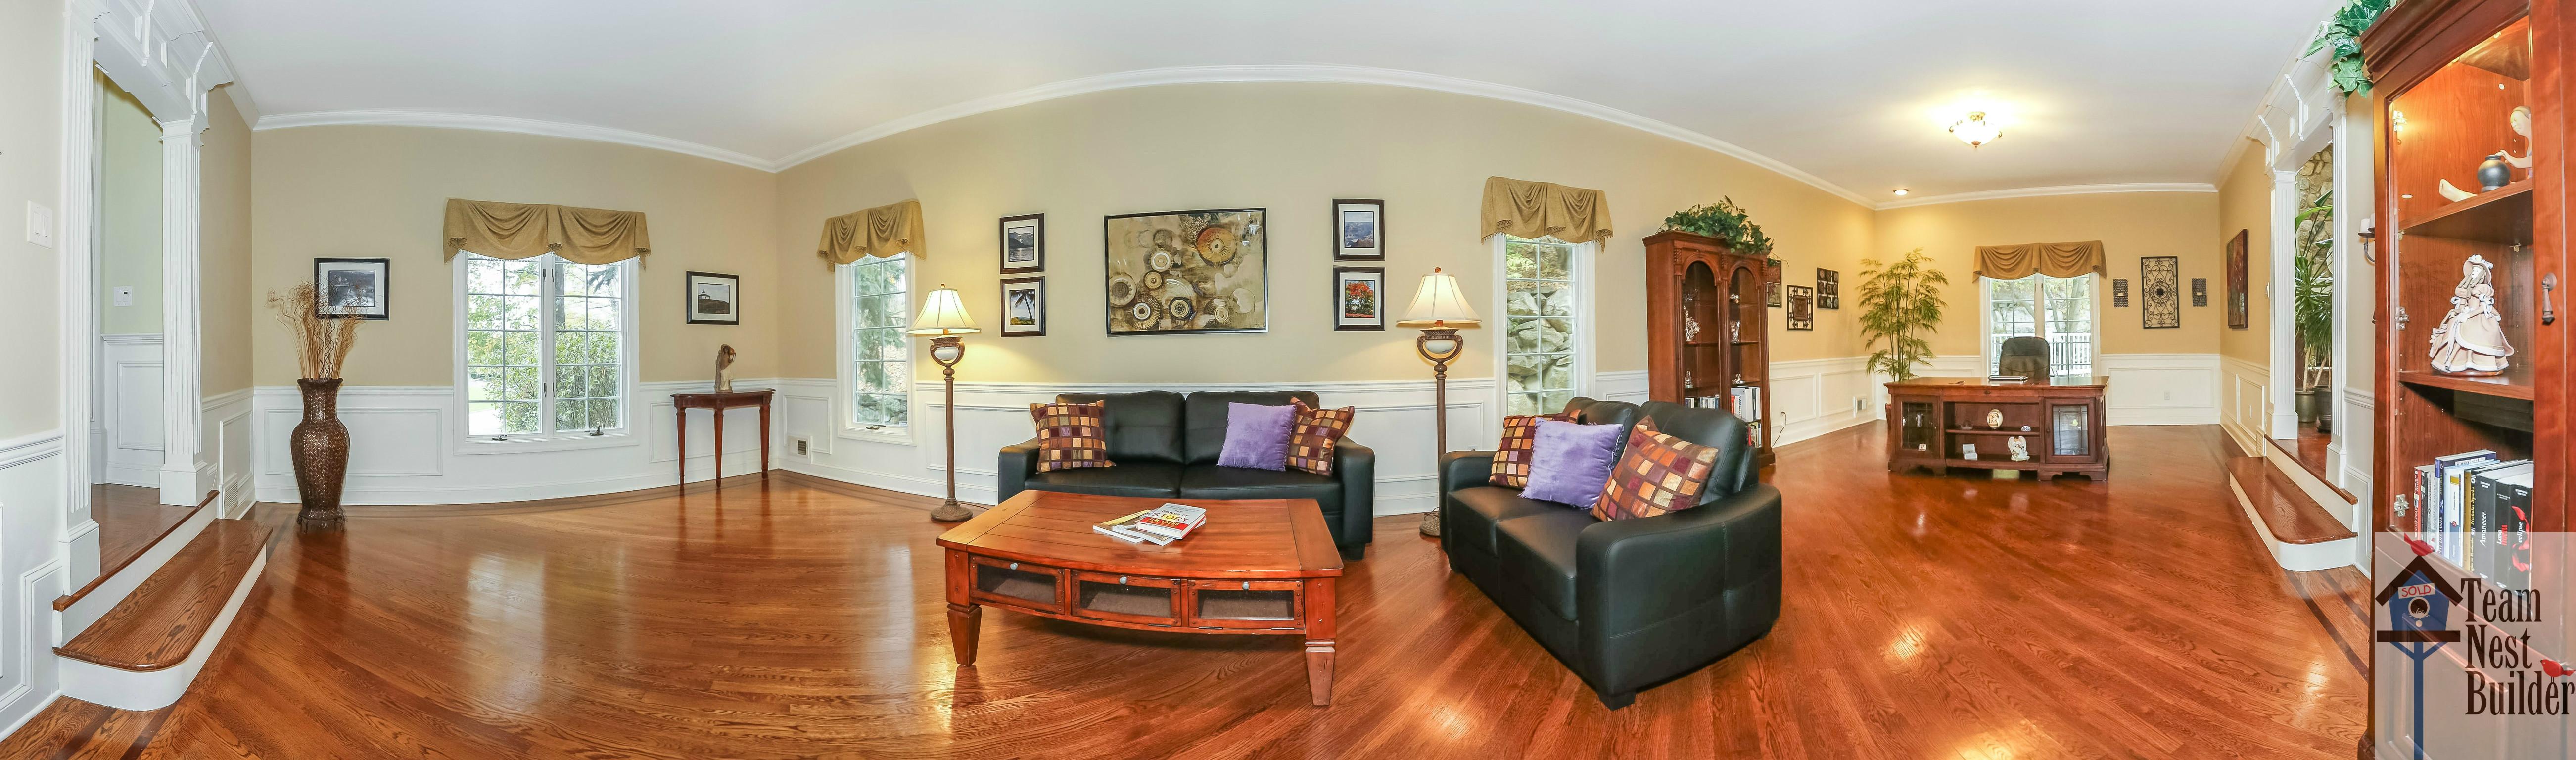 4 Lambert Living Room